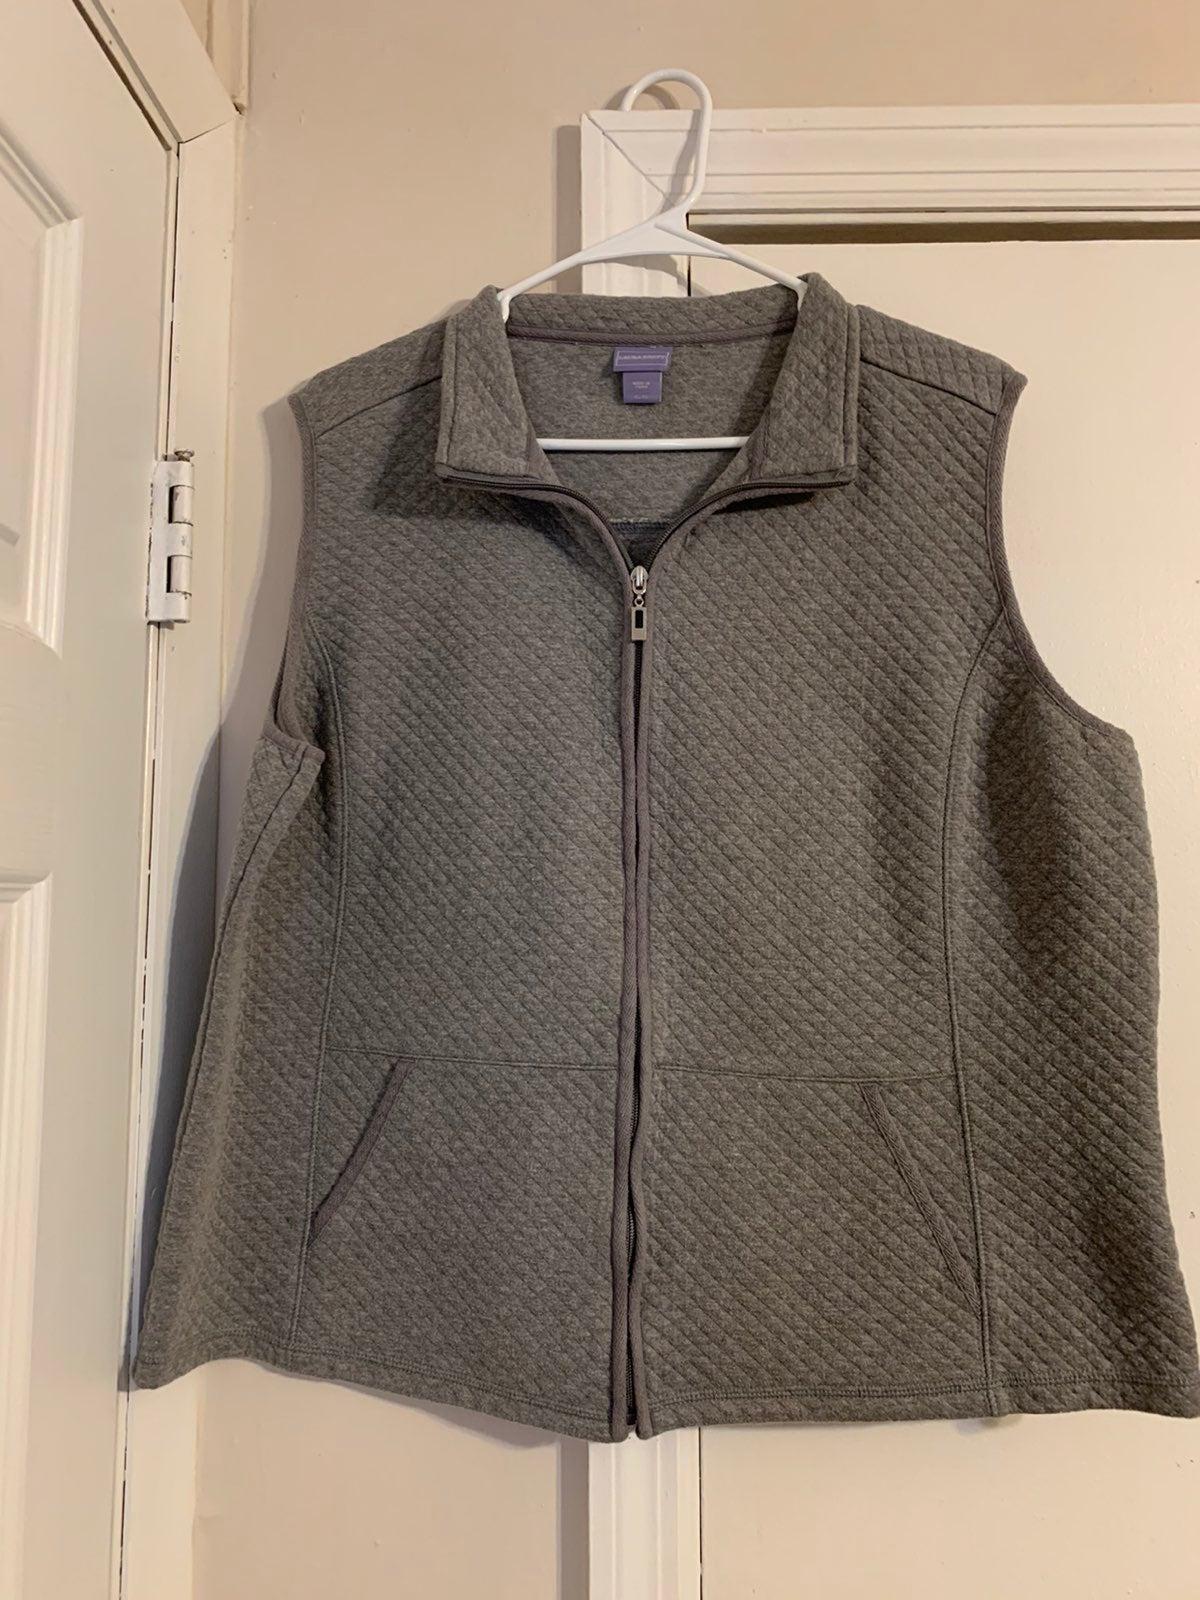 Women's XL Quilted Vest - Laura Scott